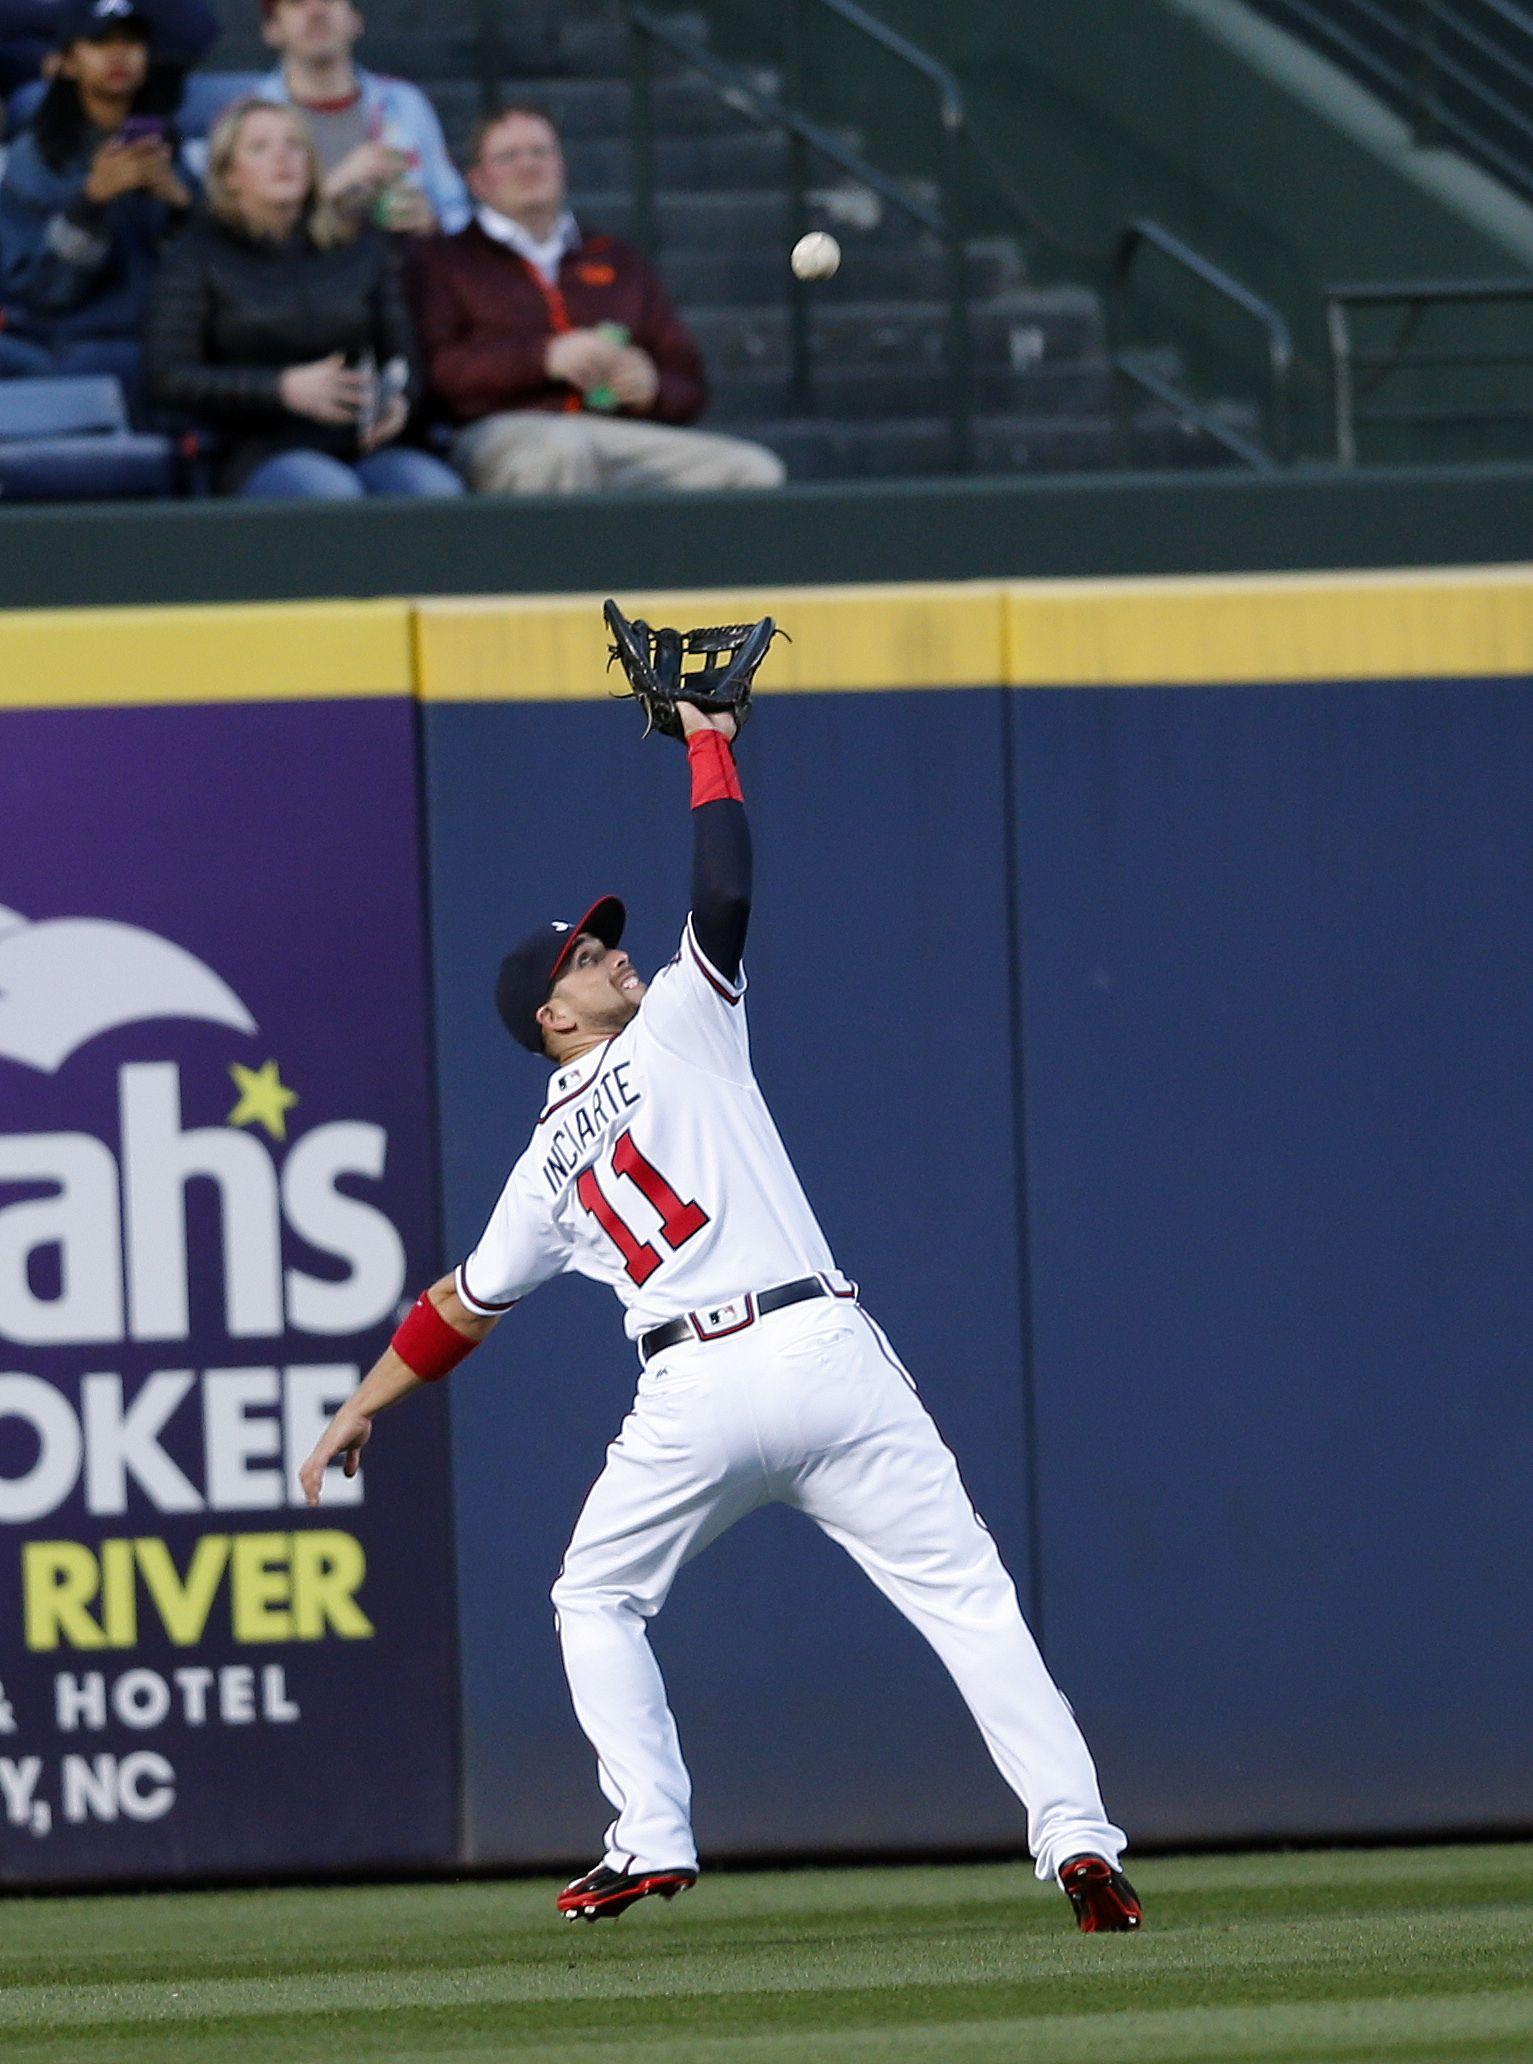 Atlanta Braves Center Fielder Ender Inciarte 11 Gets Under A Fly Ball Off The Bat Of St Louis Cardina Atlanta Braves Atlanta Braves Baseball Braves Baseball